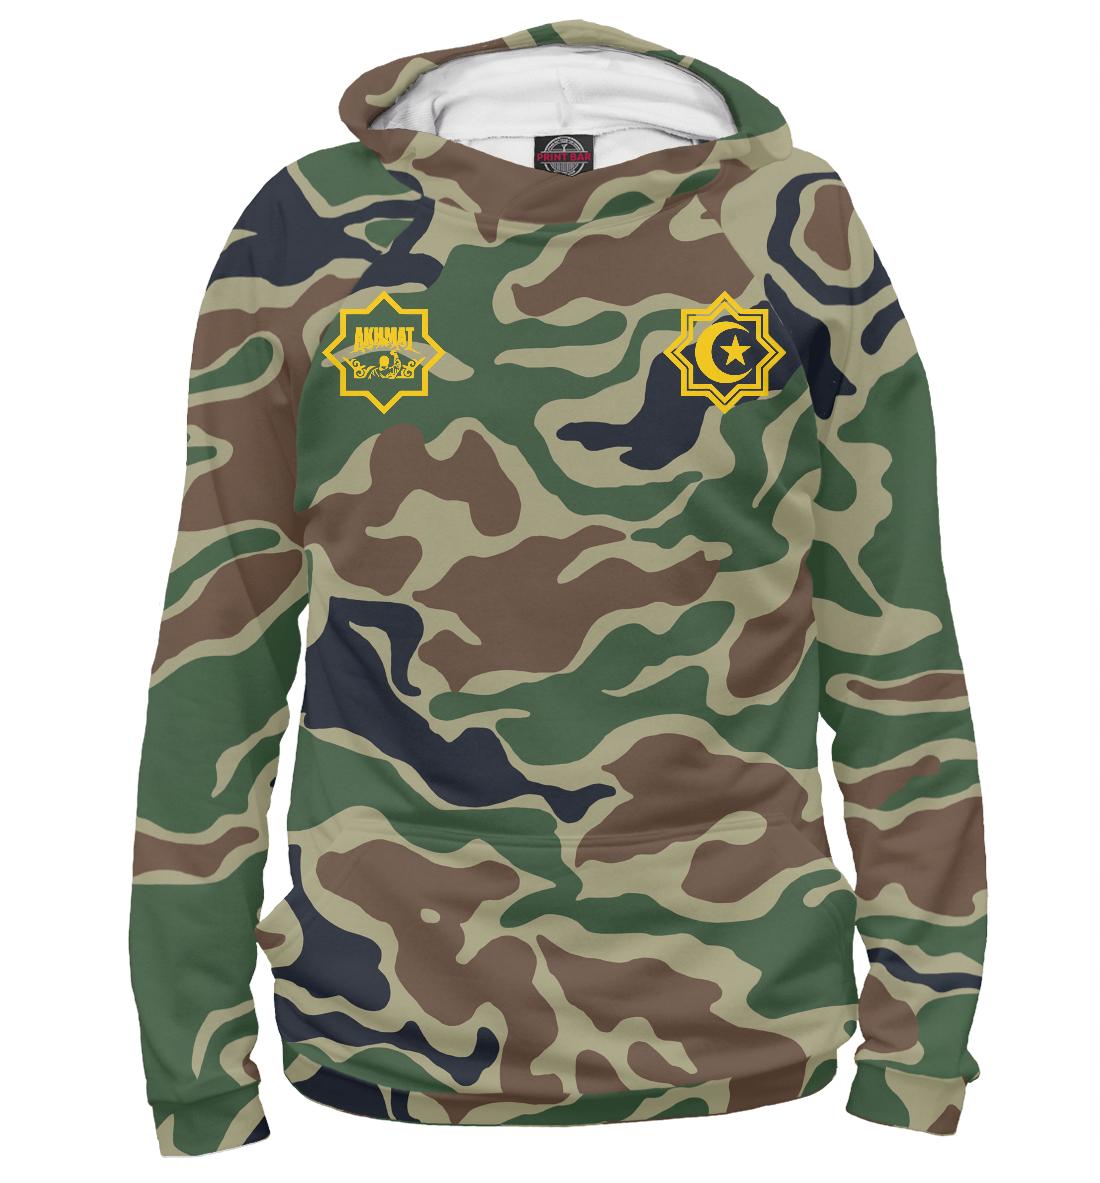 Купить Akhmat Chechen Republic, Printbar, Худи, AFC-968199-hud-1